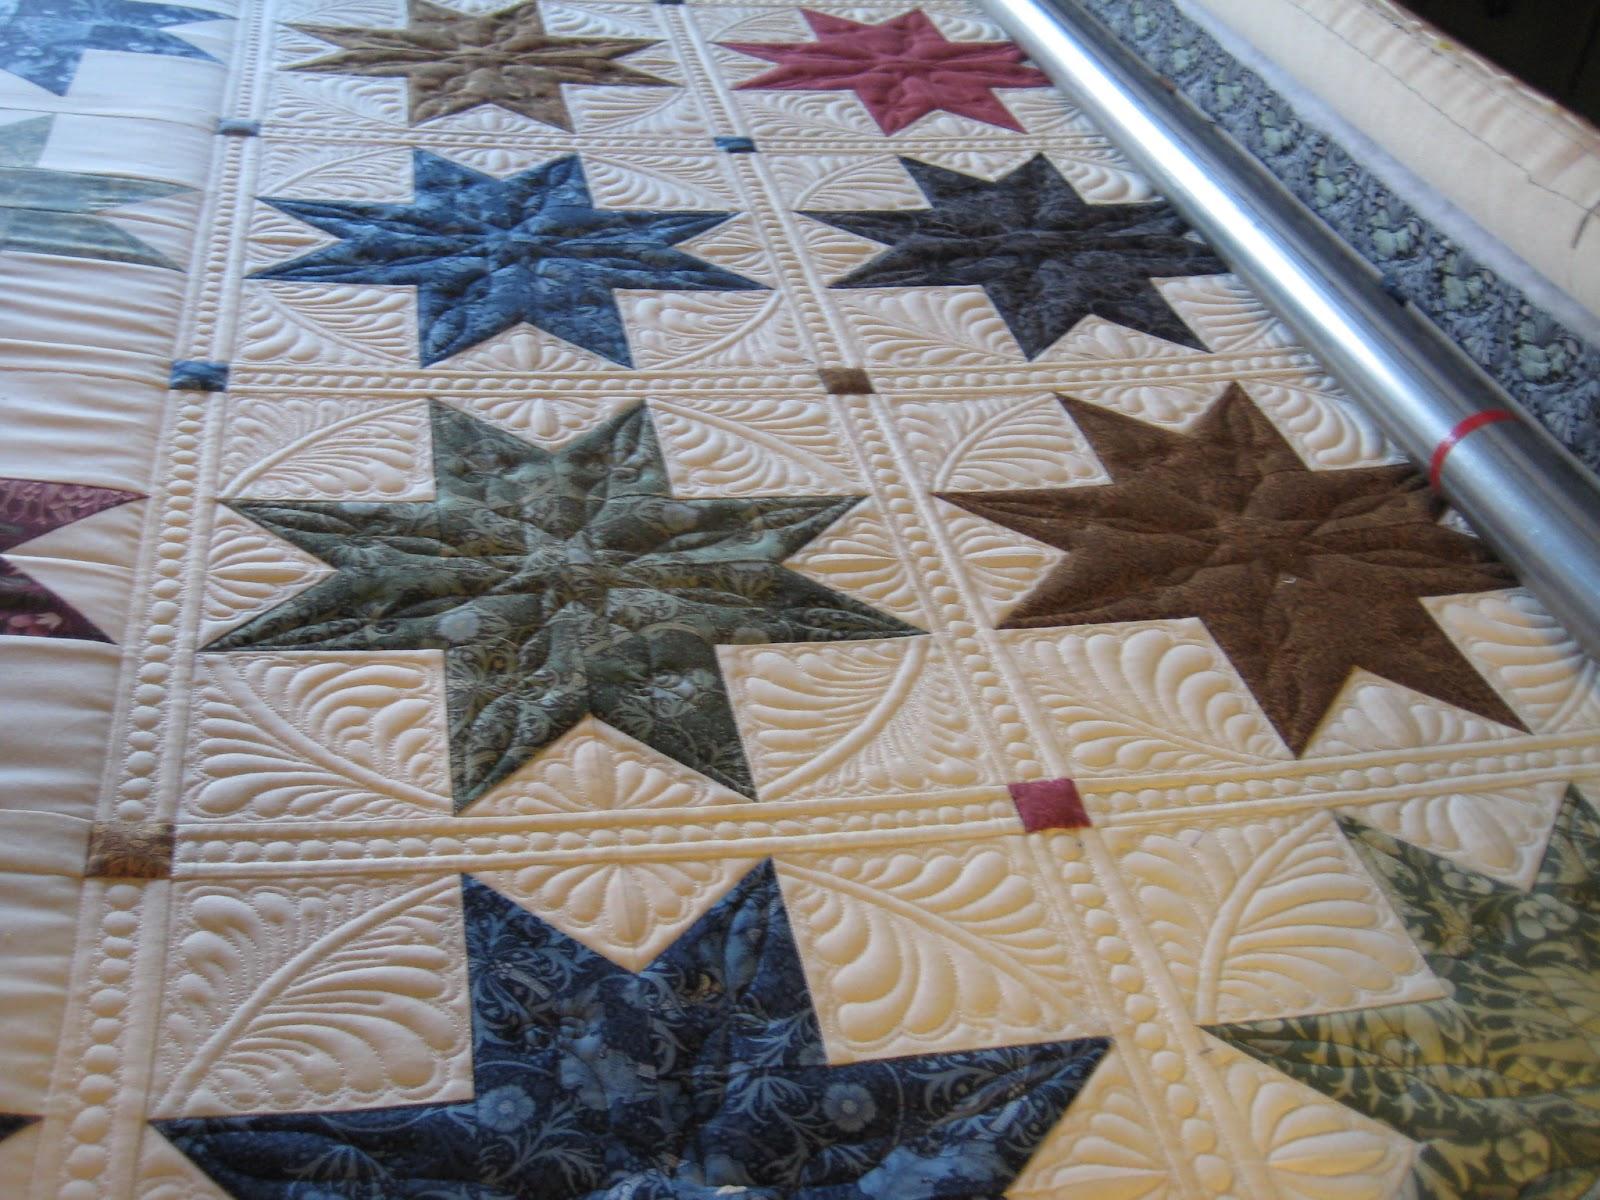 Threads On The Floor Star Quilt Progress